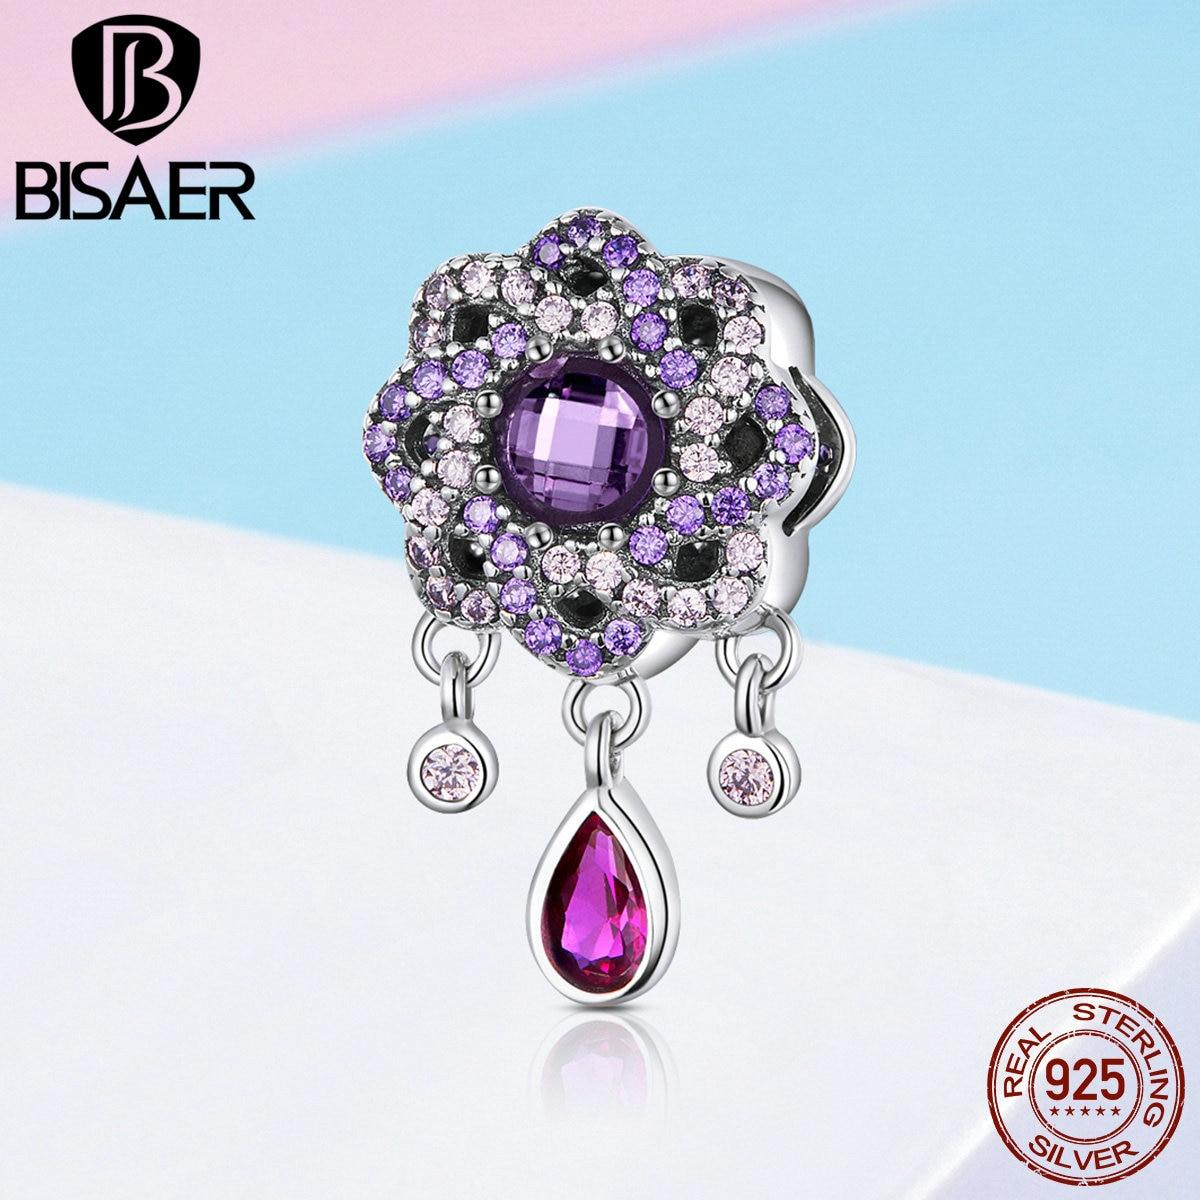 BISAER Genuine 925 Sterling Silver Purple CZ Flower Charms Zircon Geometric Flower Beads fit for Silver 925 Jewelry ECC1075